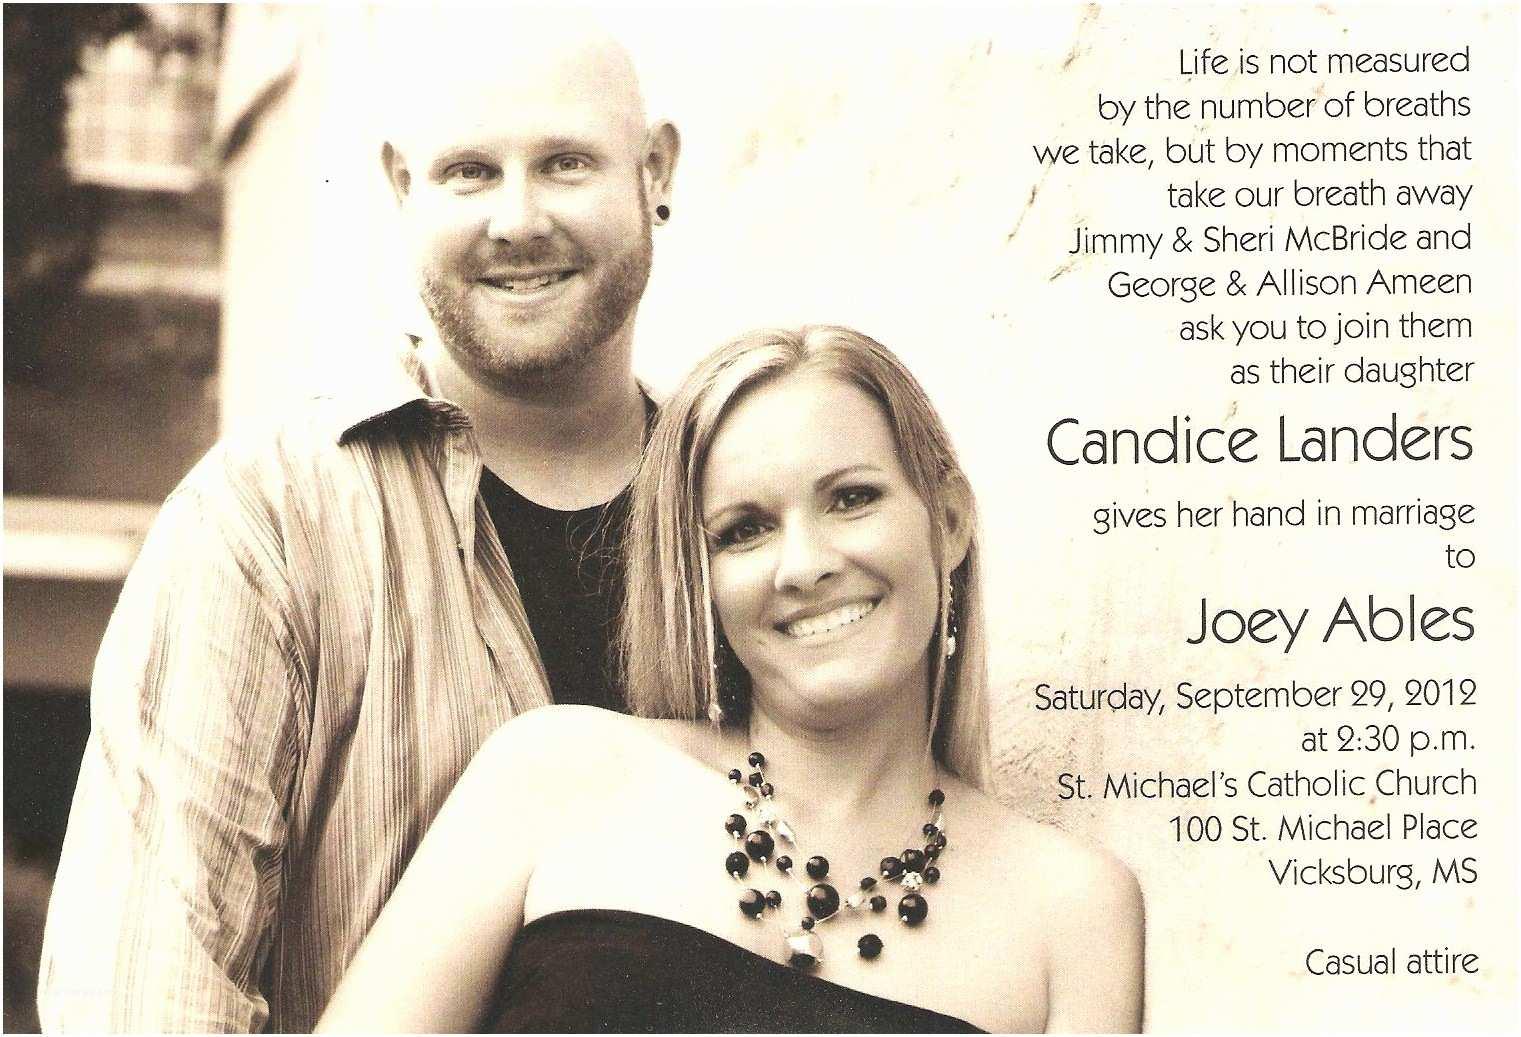 Wedding Invitation Wording From Nephew Marian S Hunting Stories Etc Etc Etc A